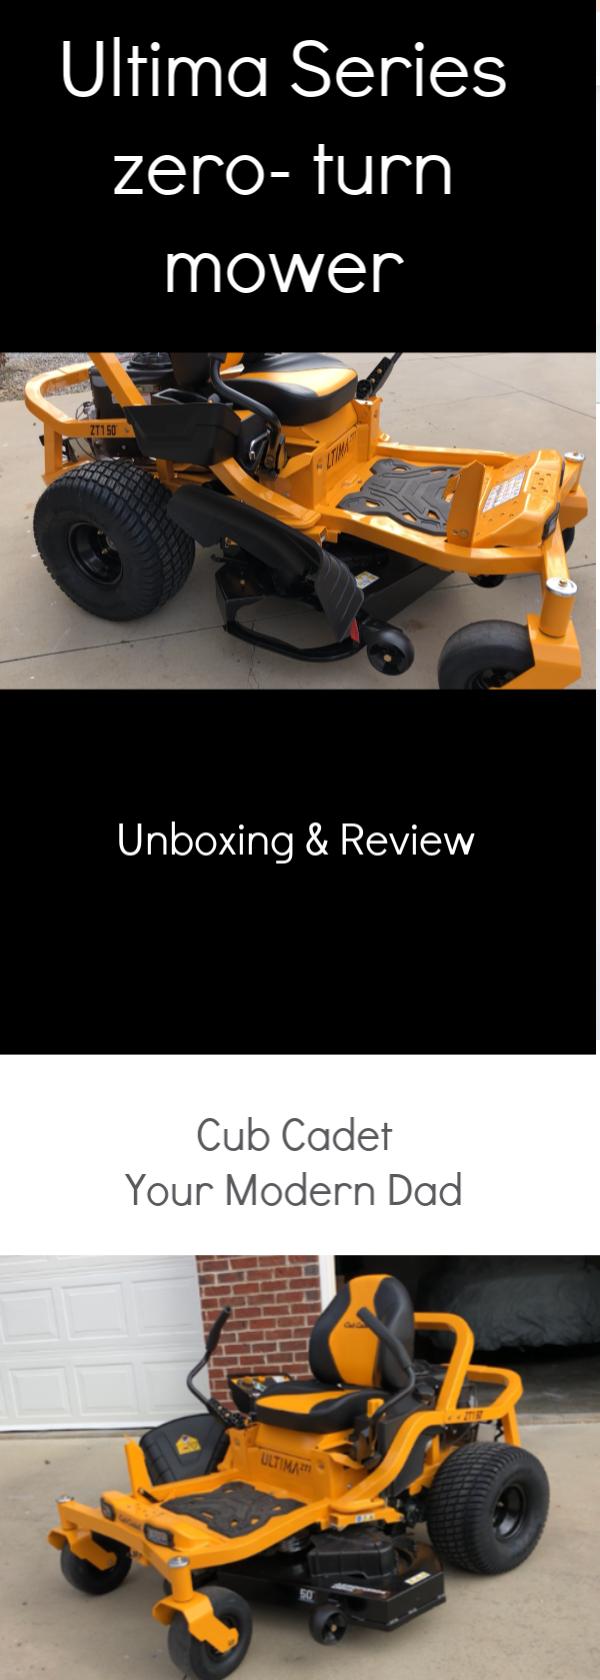 3ebafc0e1a8 Cub Cadet Ultima Series zero- turn mower review #ad @CubCadet_USA #Lawncare  #unboxing #review #tractor #cubcadet #farmlife #yard #Farming